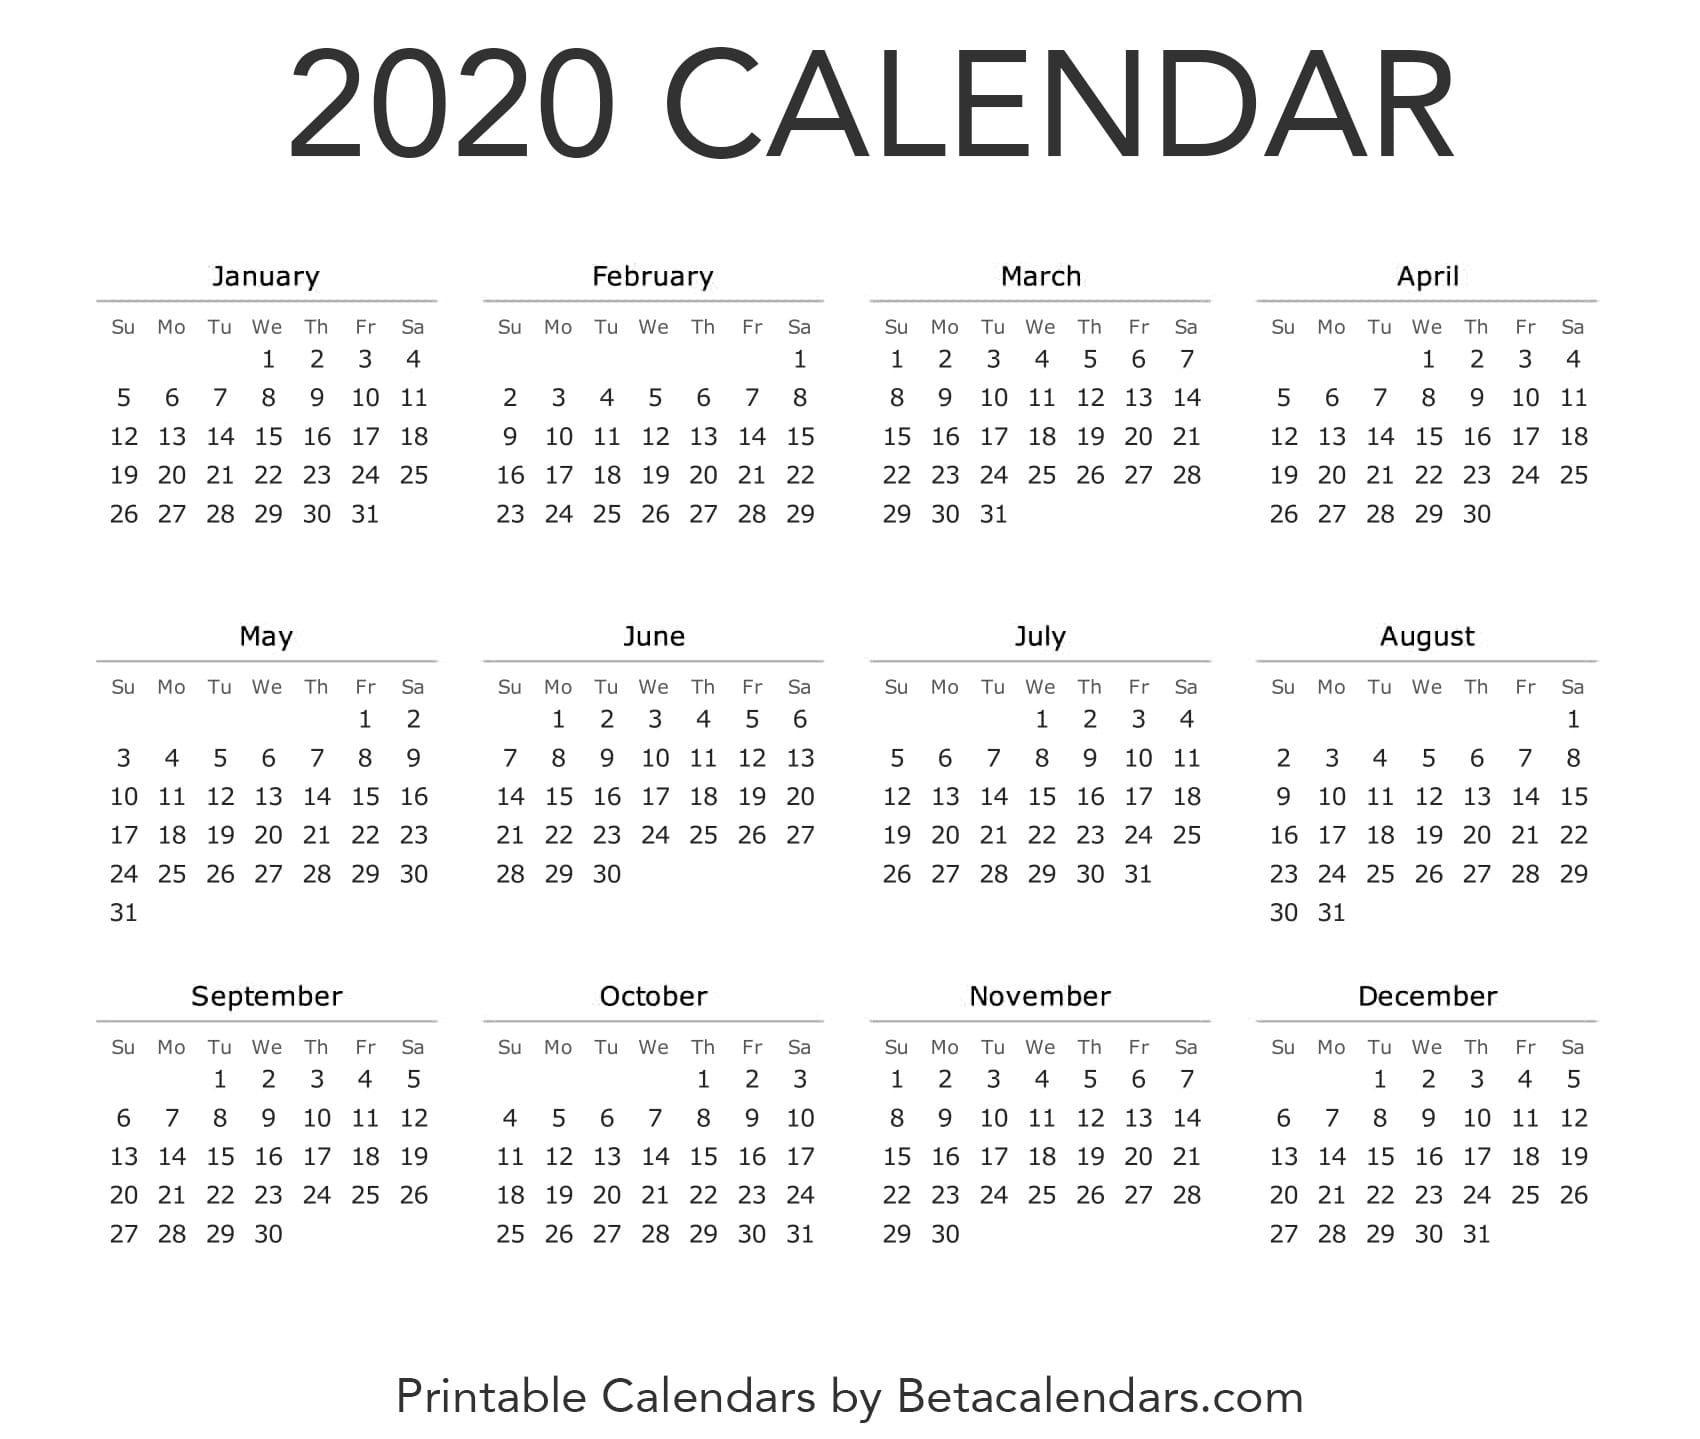 Calendar 2020 | Printable Yearly Calendar, Yearly Calendar